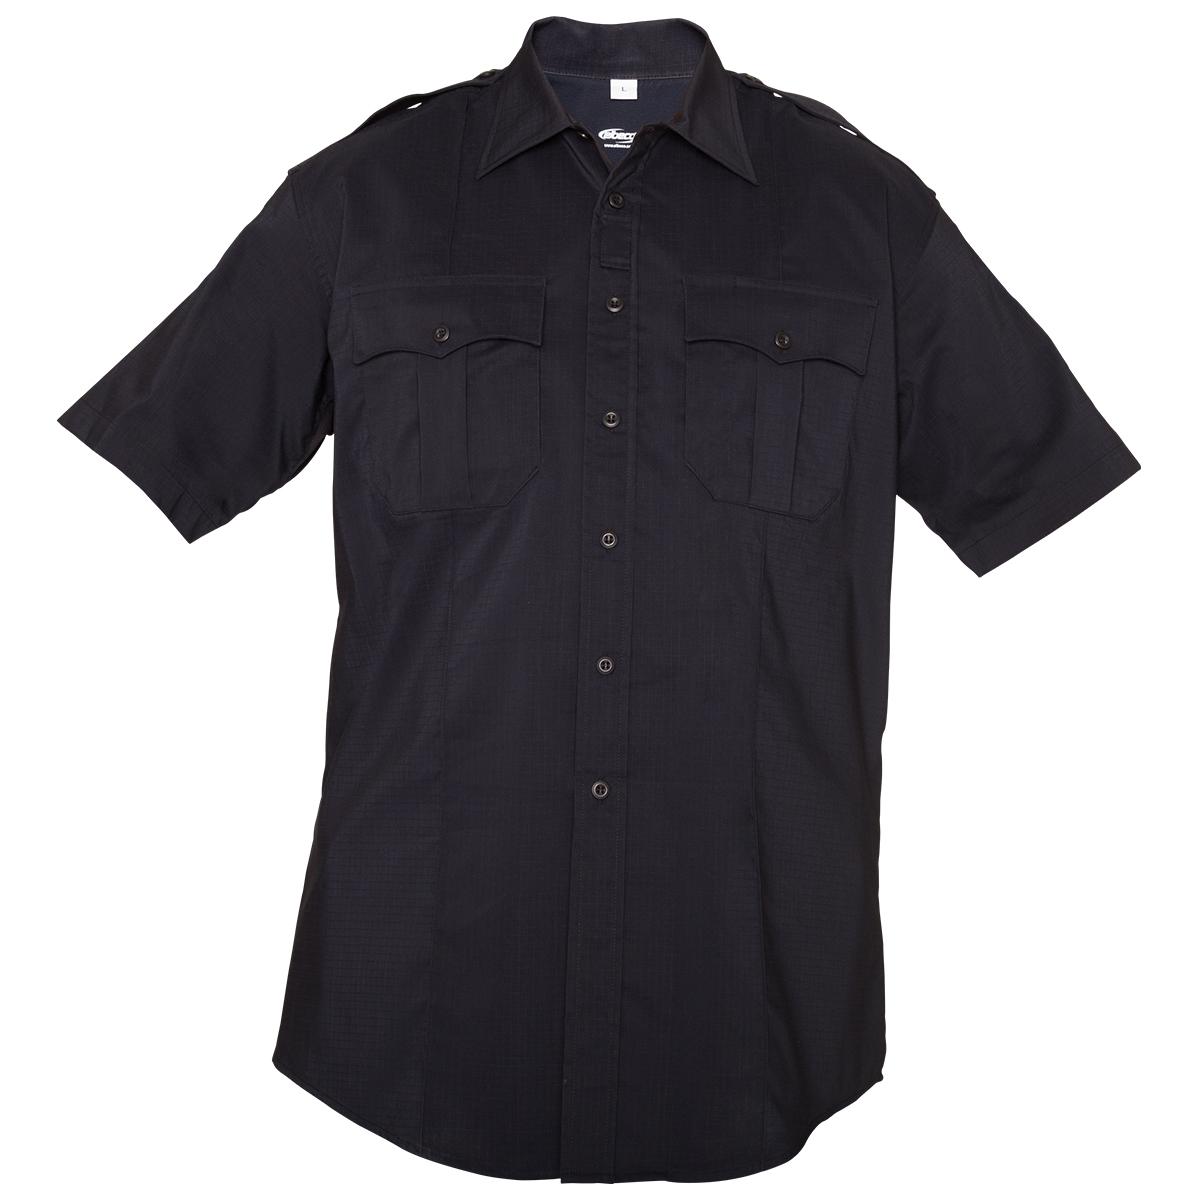 Reflex Short Sleeve Shirt-Mens-Elbeco